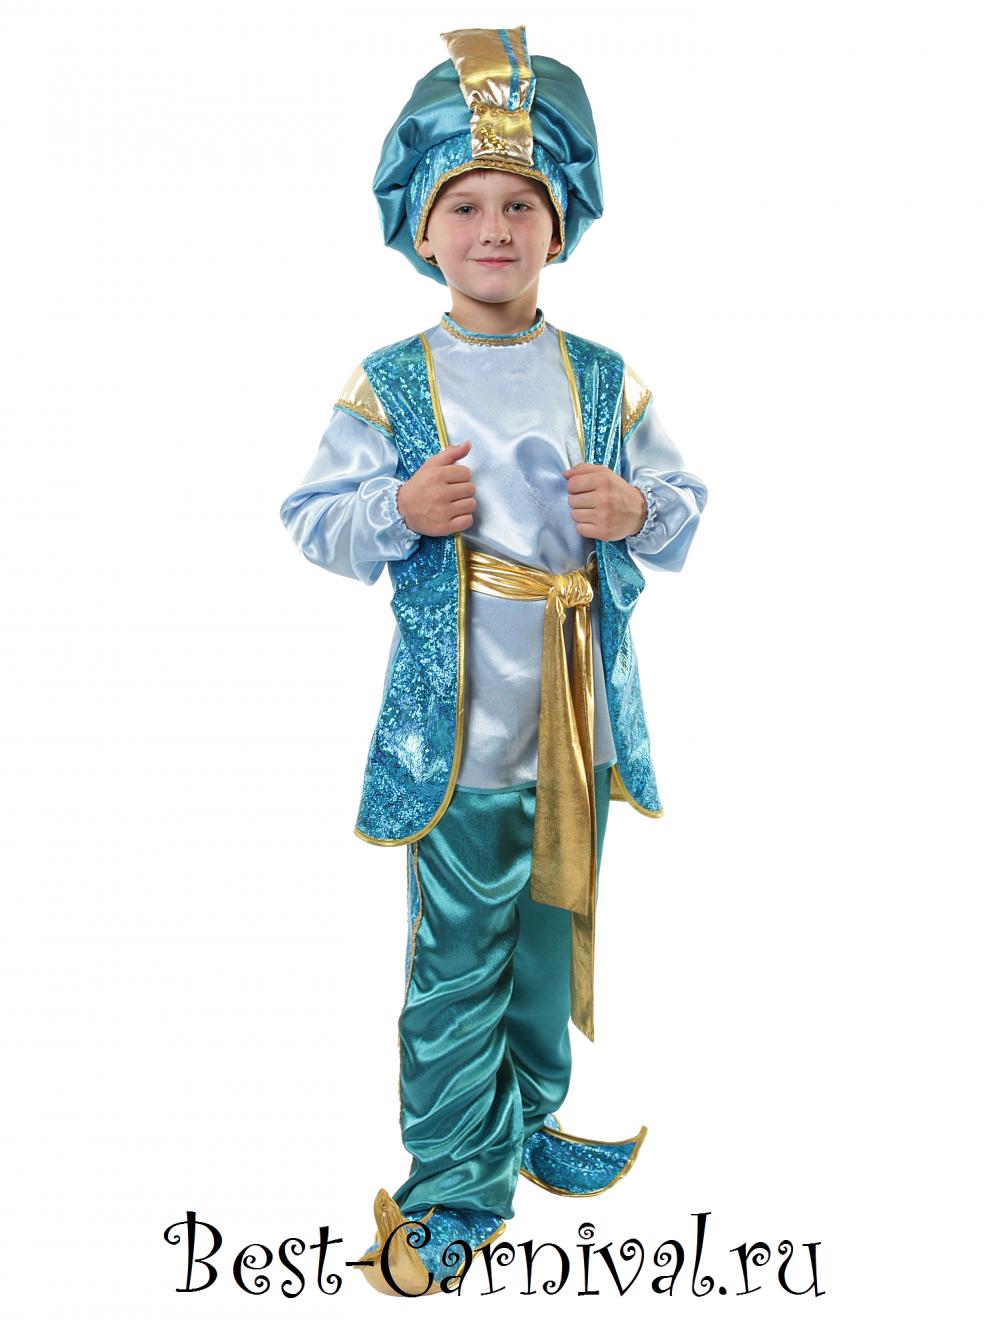 Костюм султан для мальчика своими руками фото